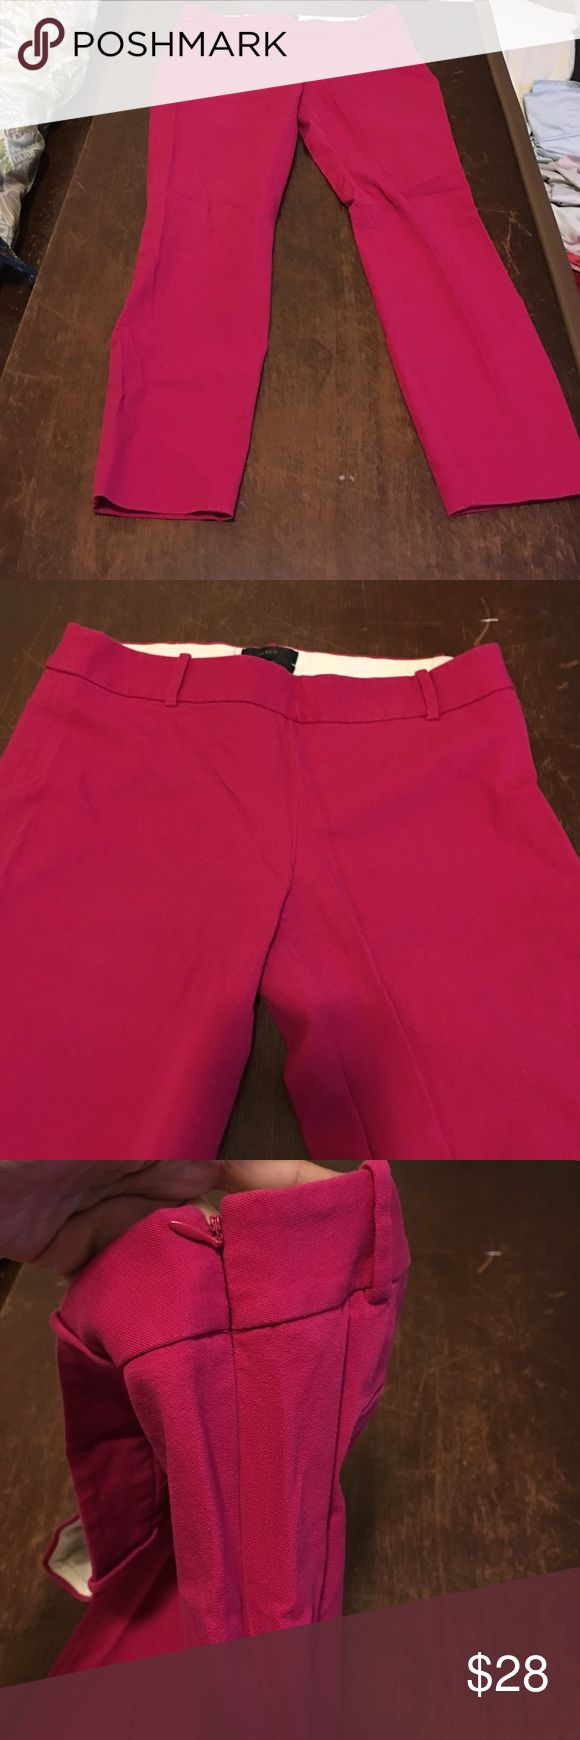 J crew ankle length Minnie pants Pink ankle length side zipper cotton stretch Minnie JCrew pants J. Crew Pants Ankle & Cropped